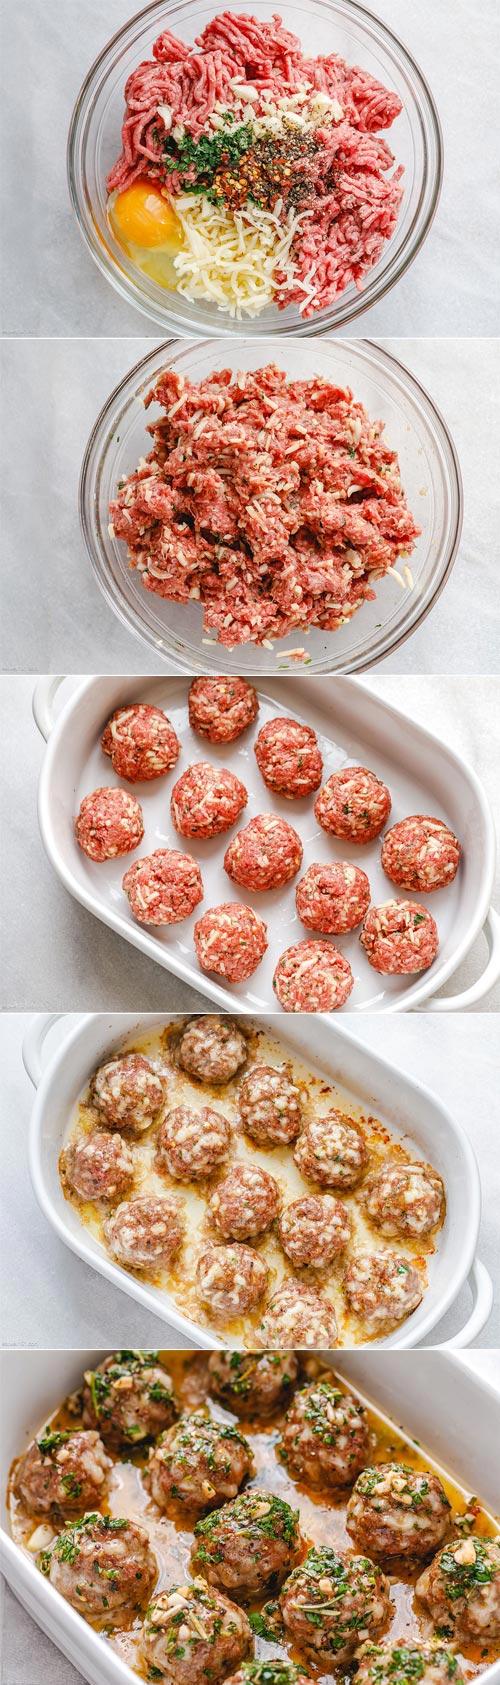 Baked Turkey Meatballs with Lemon Garlic Butter Sauce